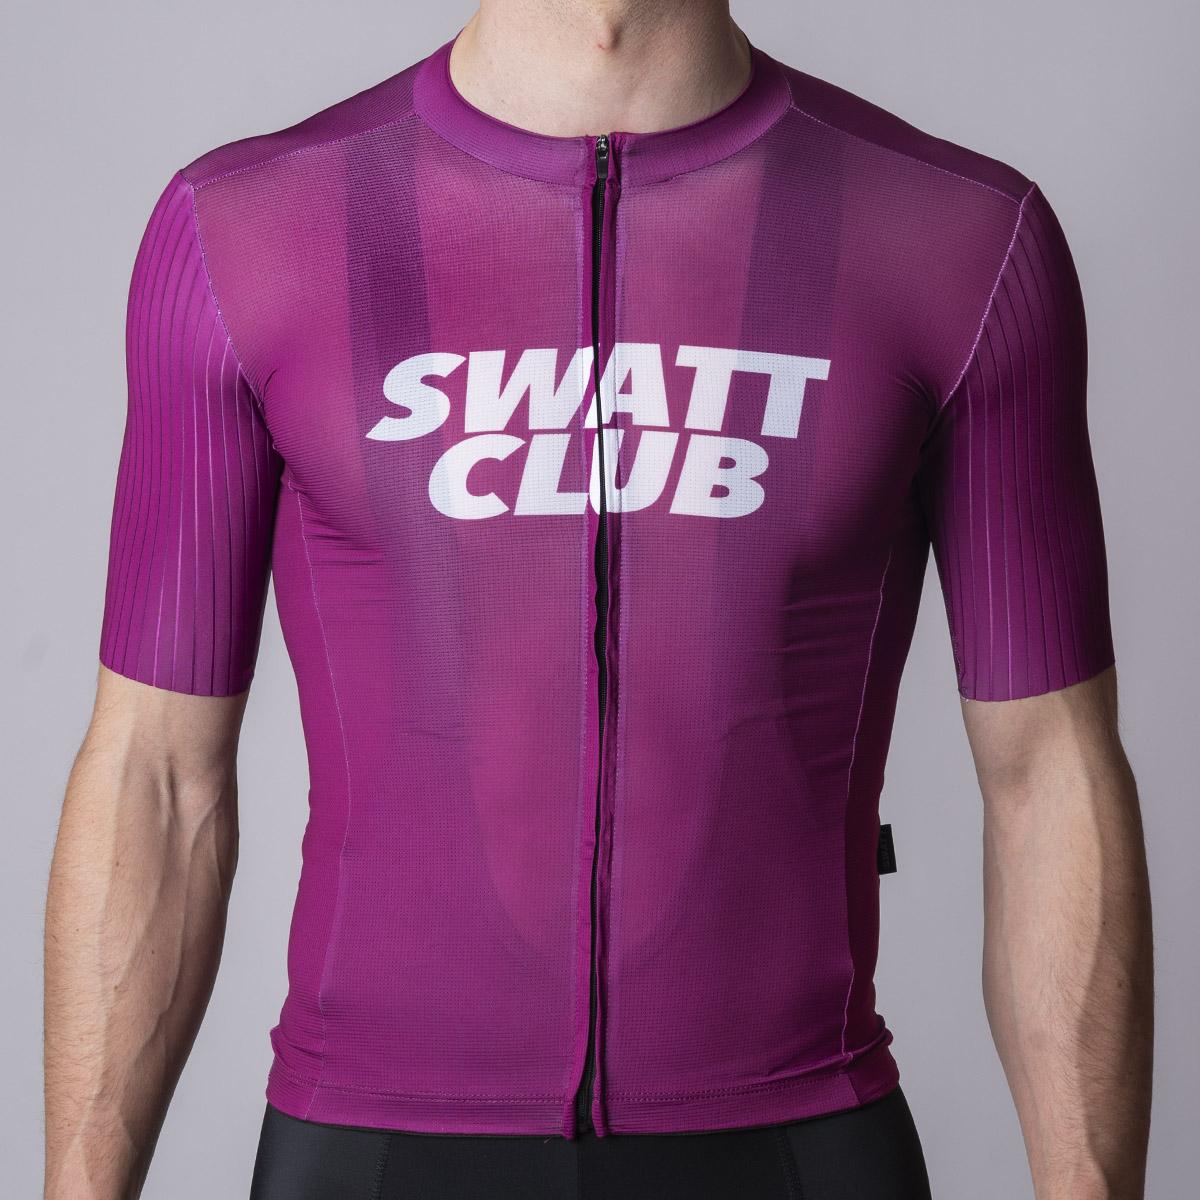 Ciclamino cycling jersey swatt club maglia ciclismo